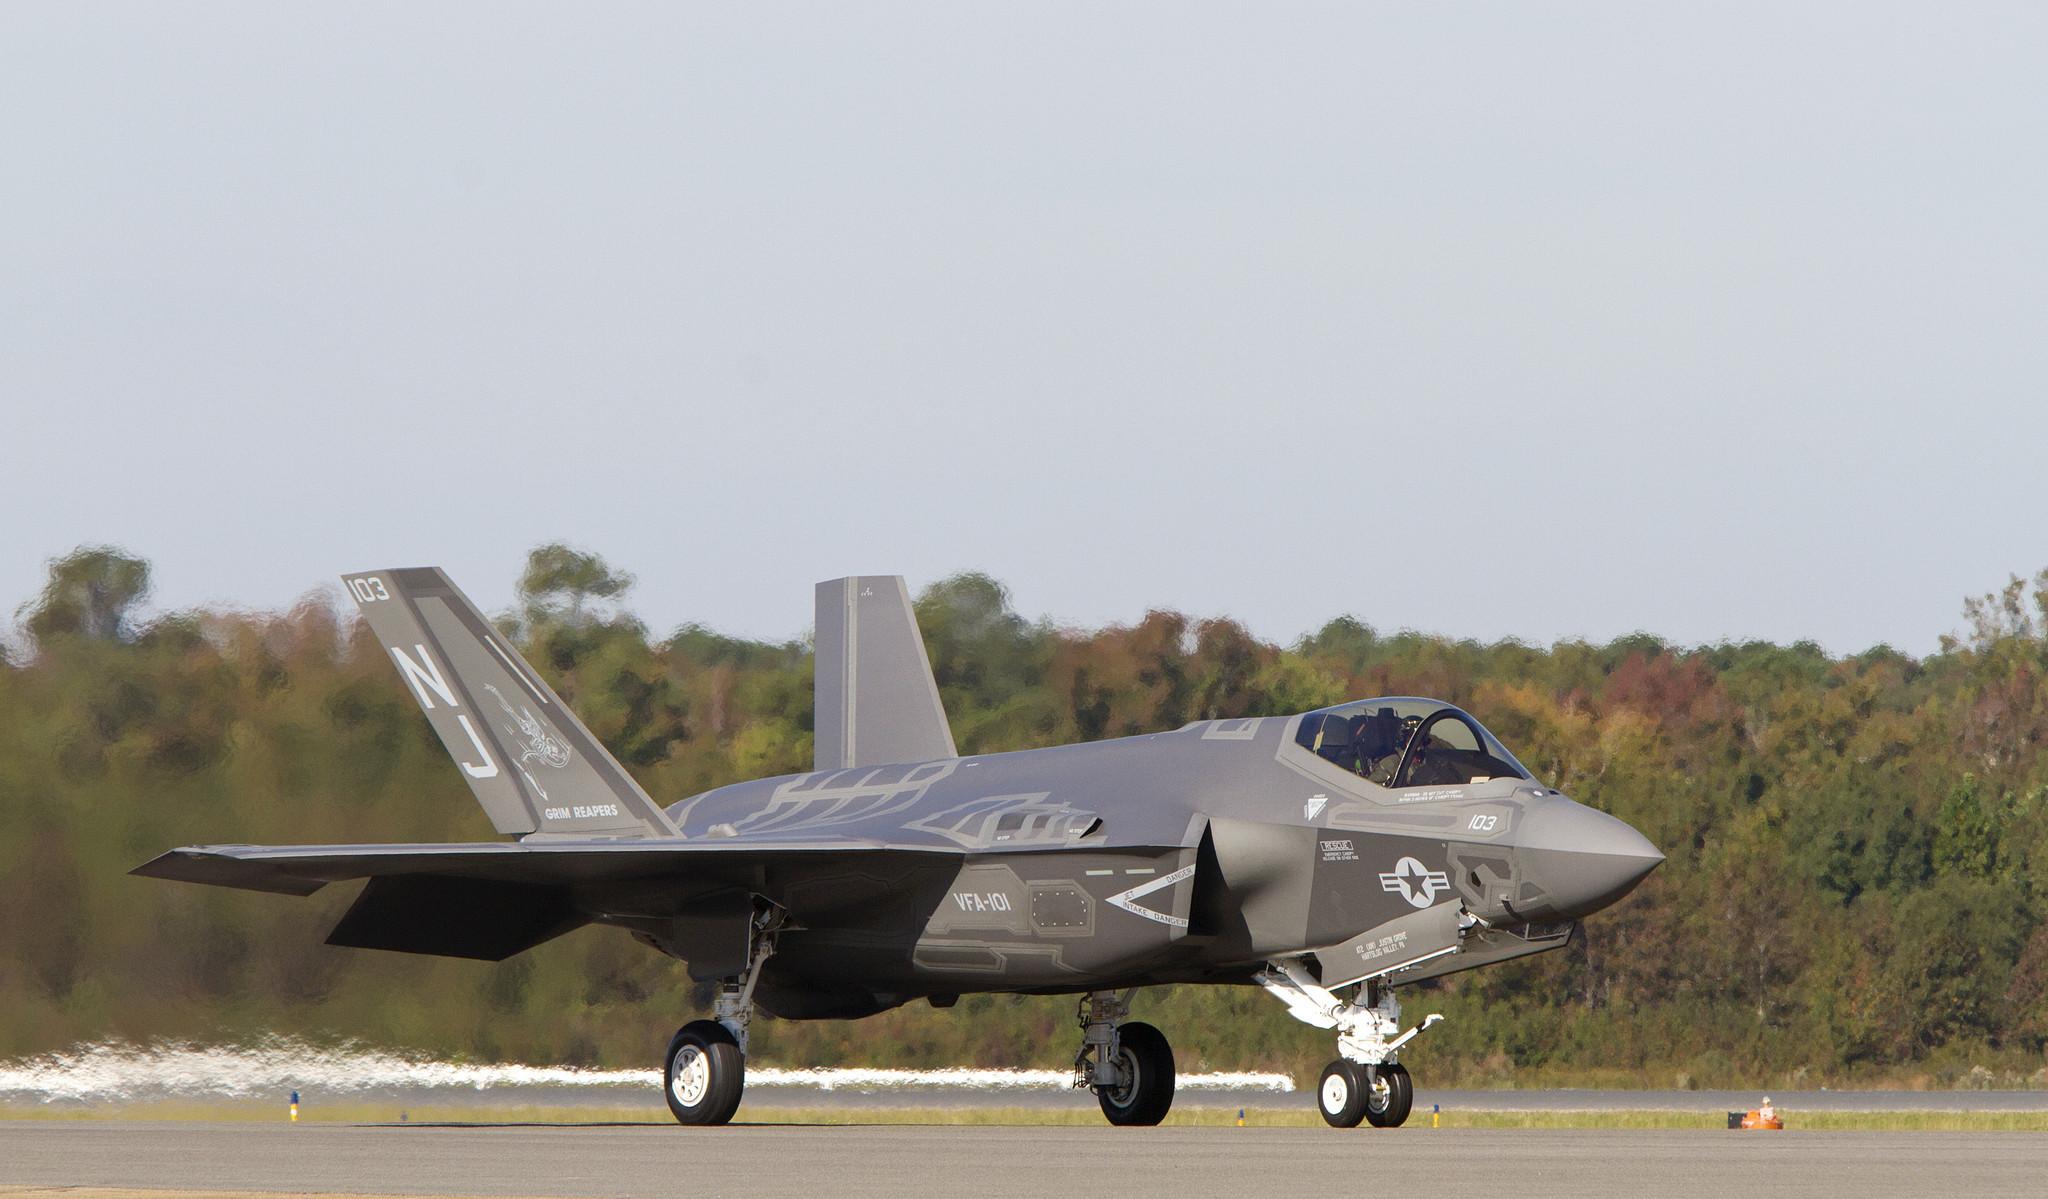 F 35 News >> Video: F-35c aircraft lands at NAS Oceana - Daily Press